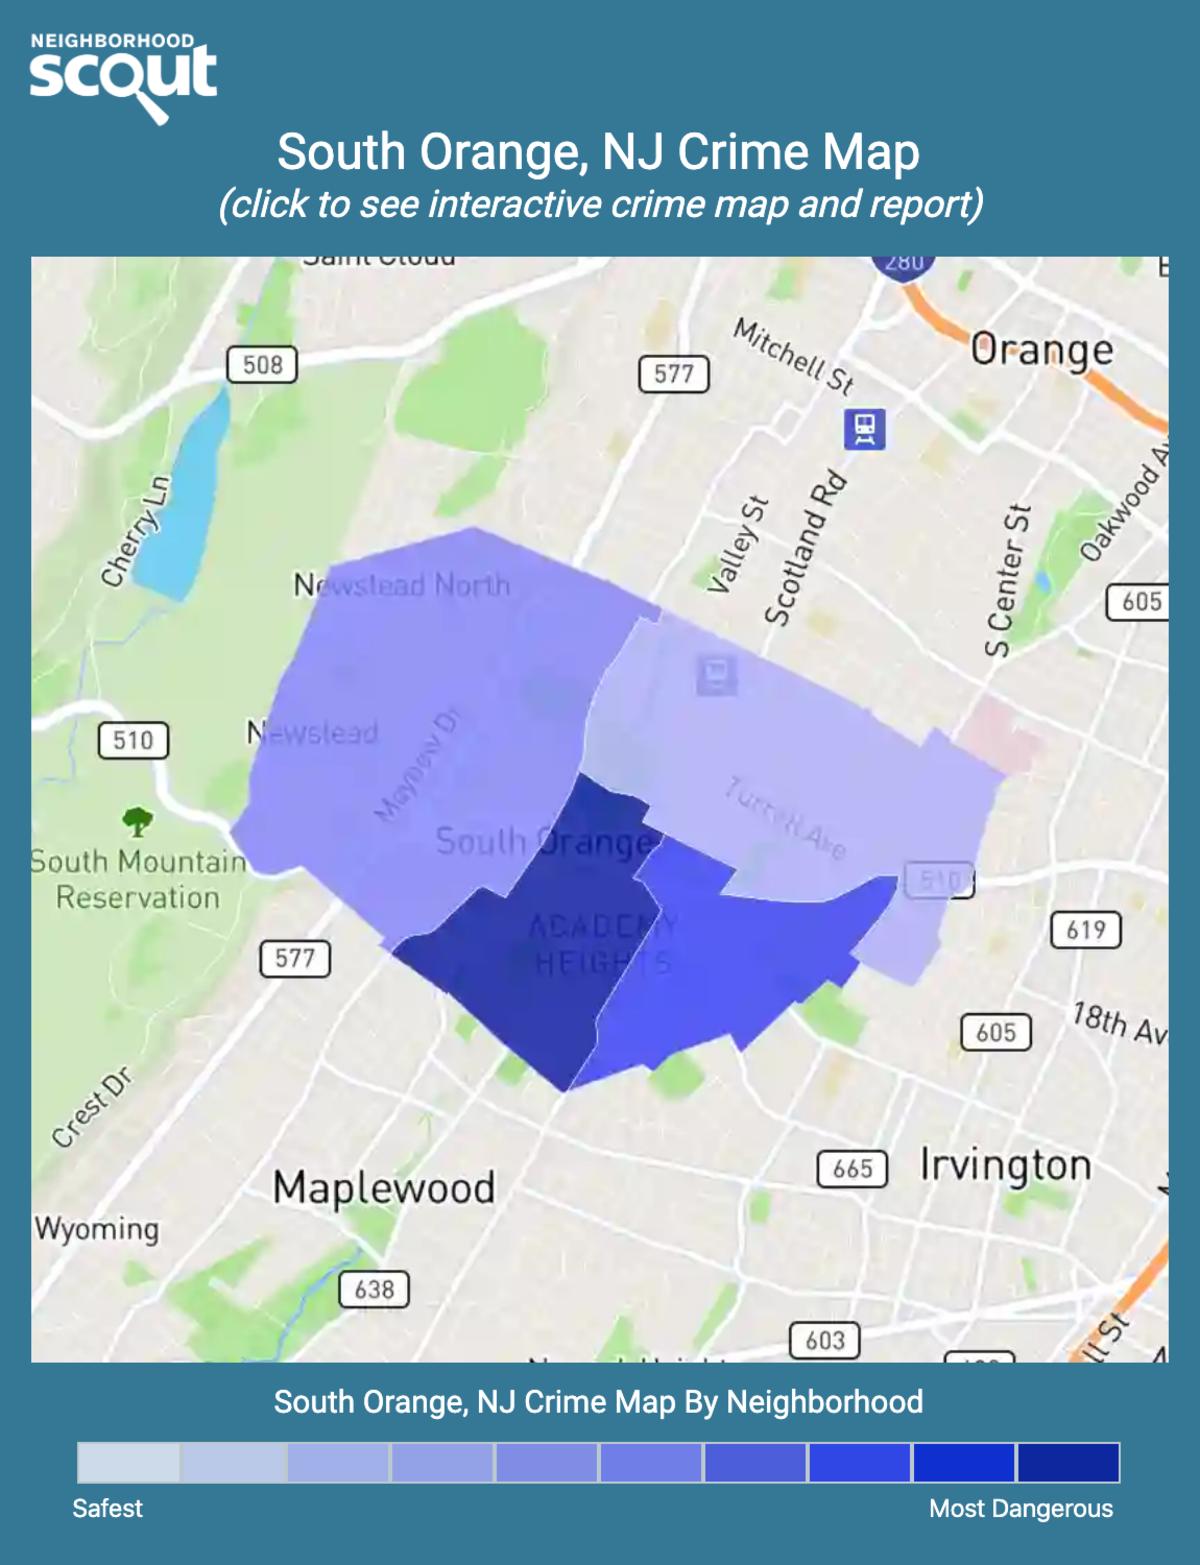 South Orange, New Jersey crime map